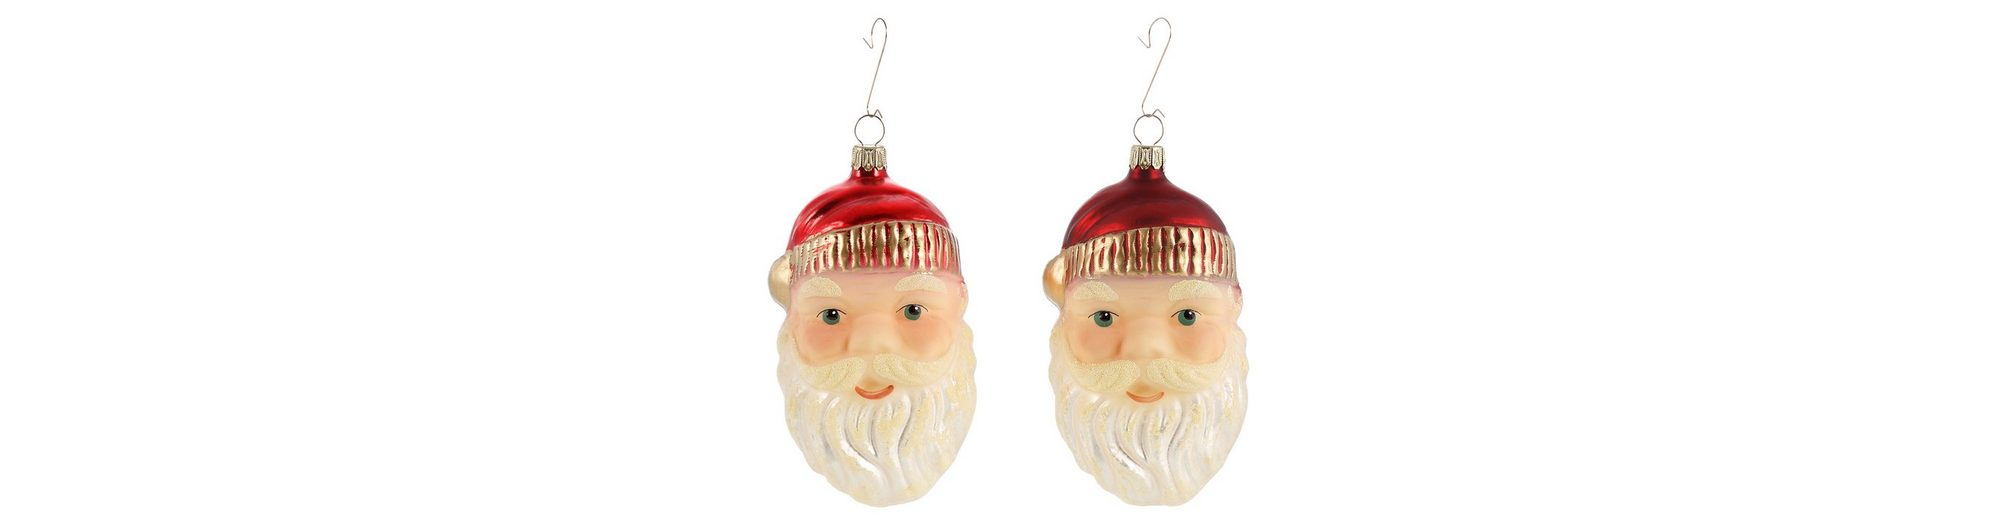 Thüringer Glasdesign Set: TGS-Christbaumschmuck Santa Gesicht »Advent« (2tlg.)